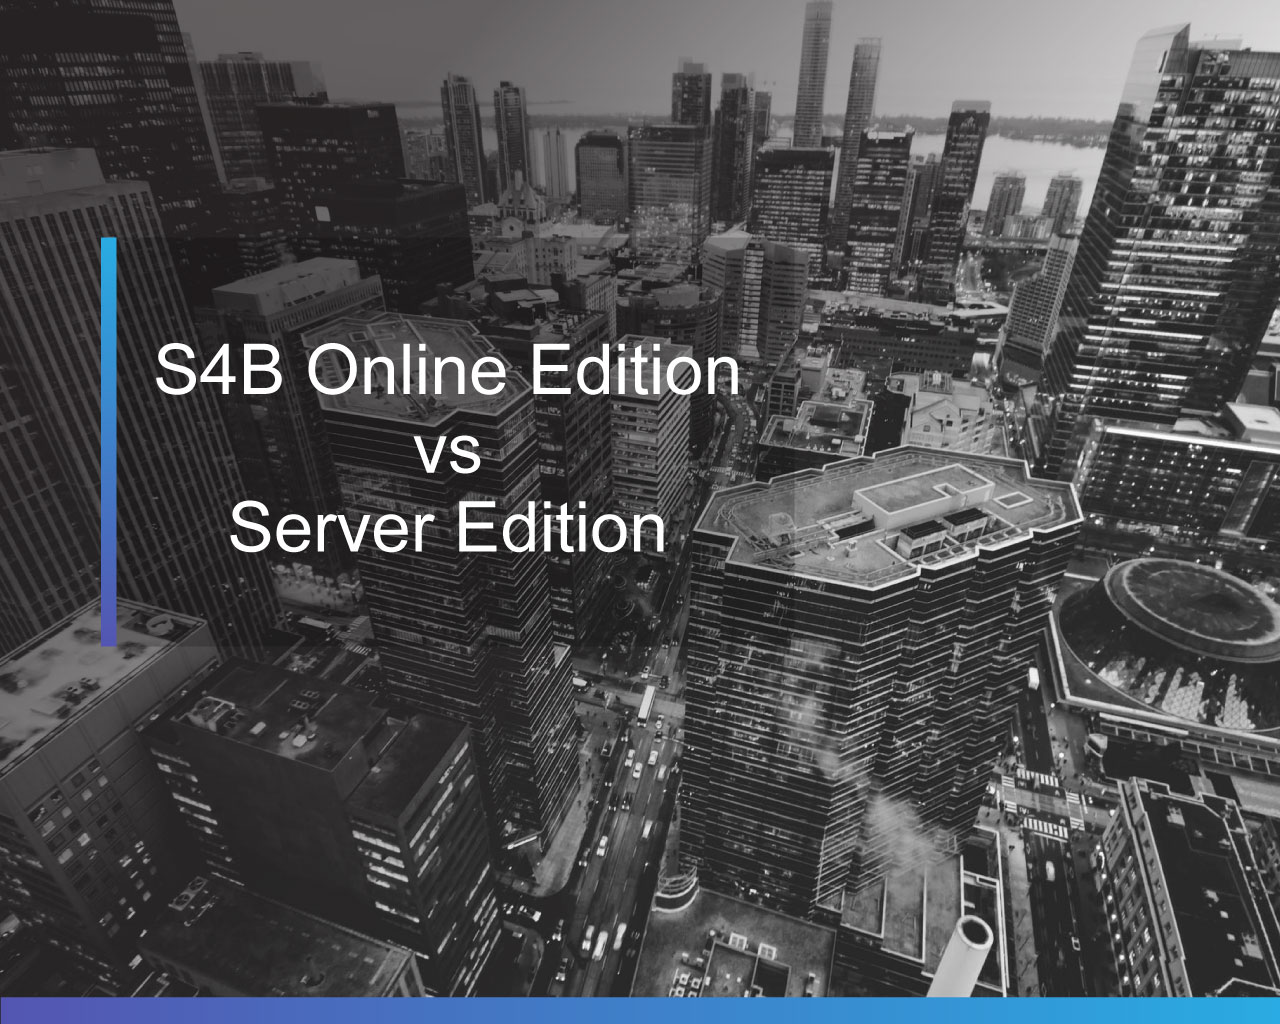 S4B Online Edition vs Server Edition